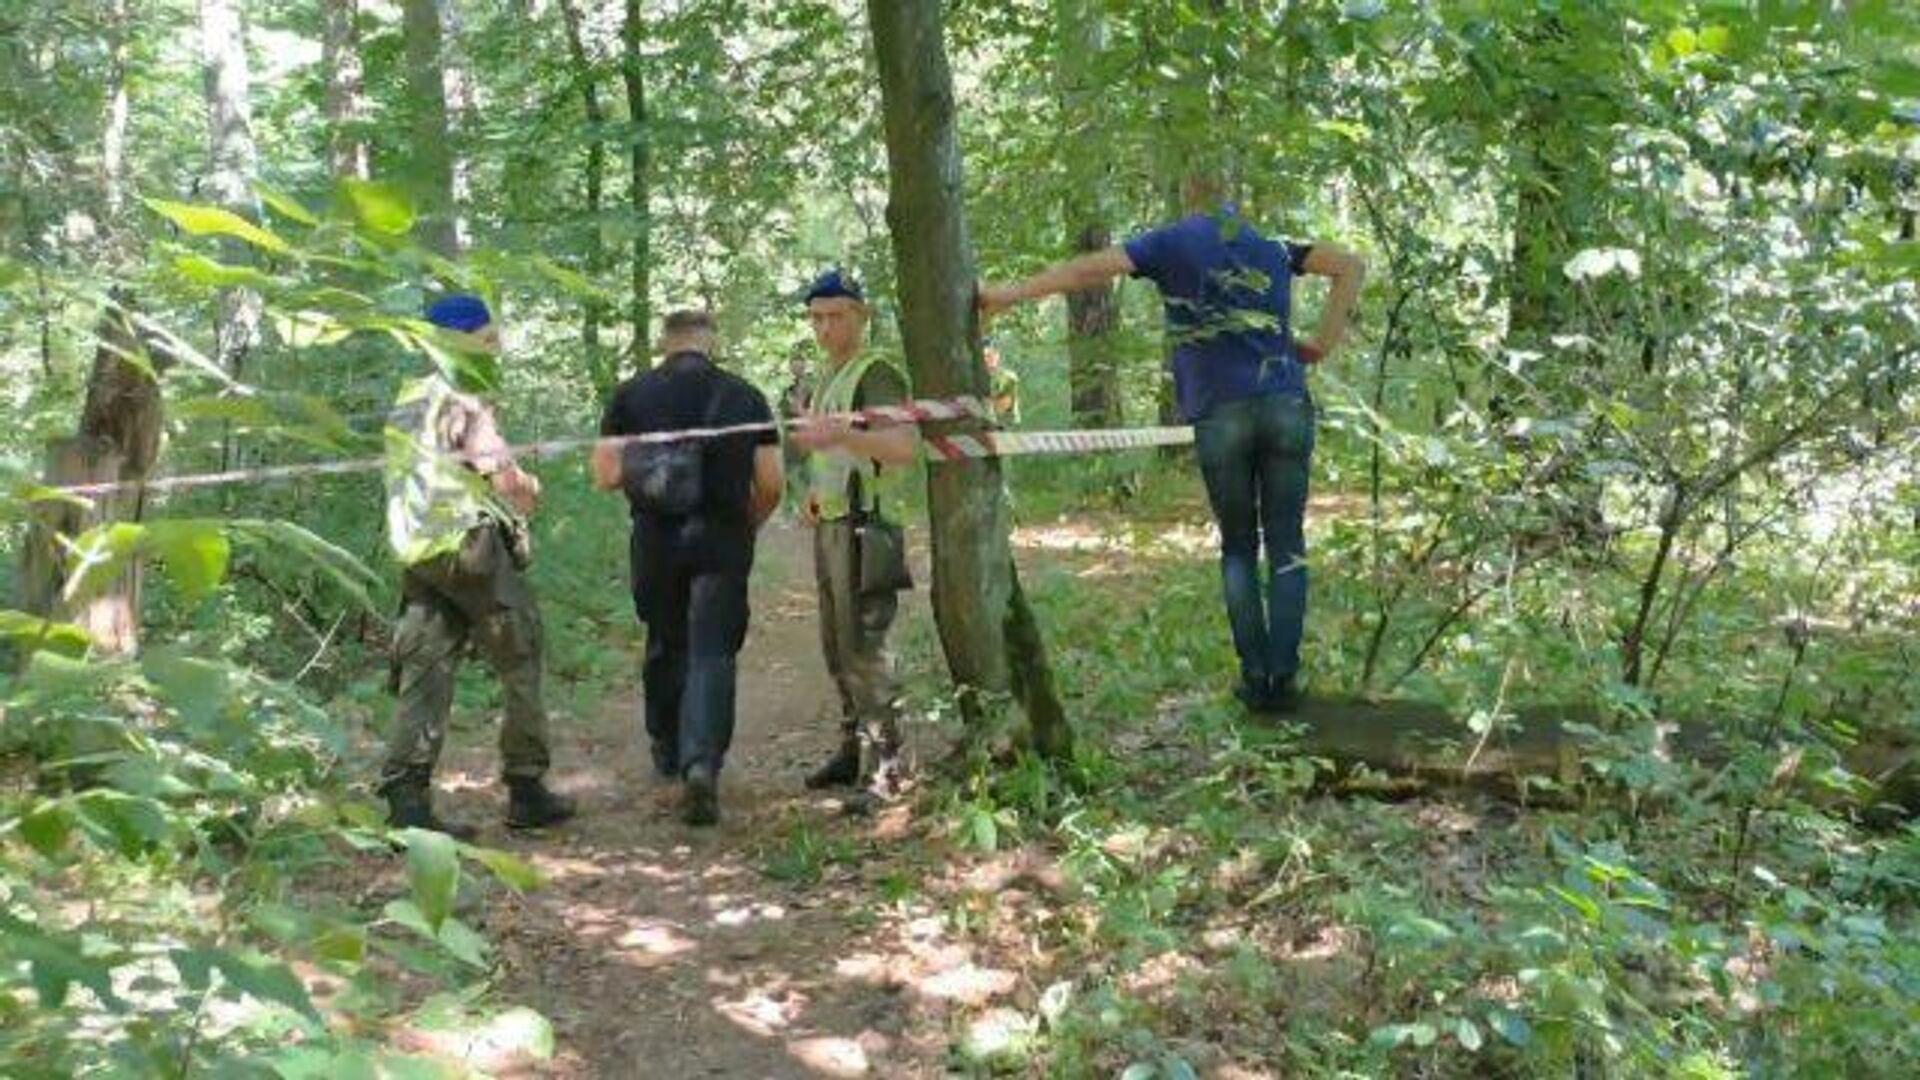 Место обнаружения тела белорусского активиста Шишова - РИА Новости, 1920, 03.08.2021